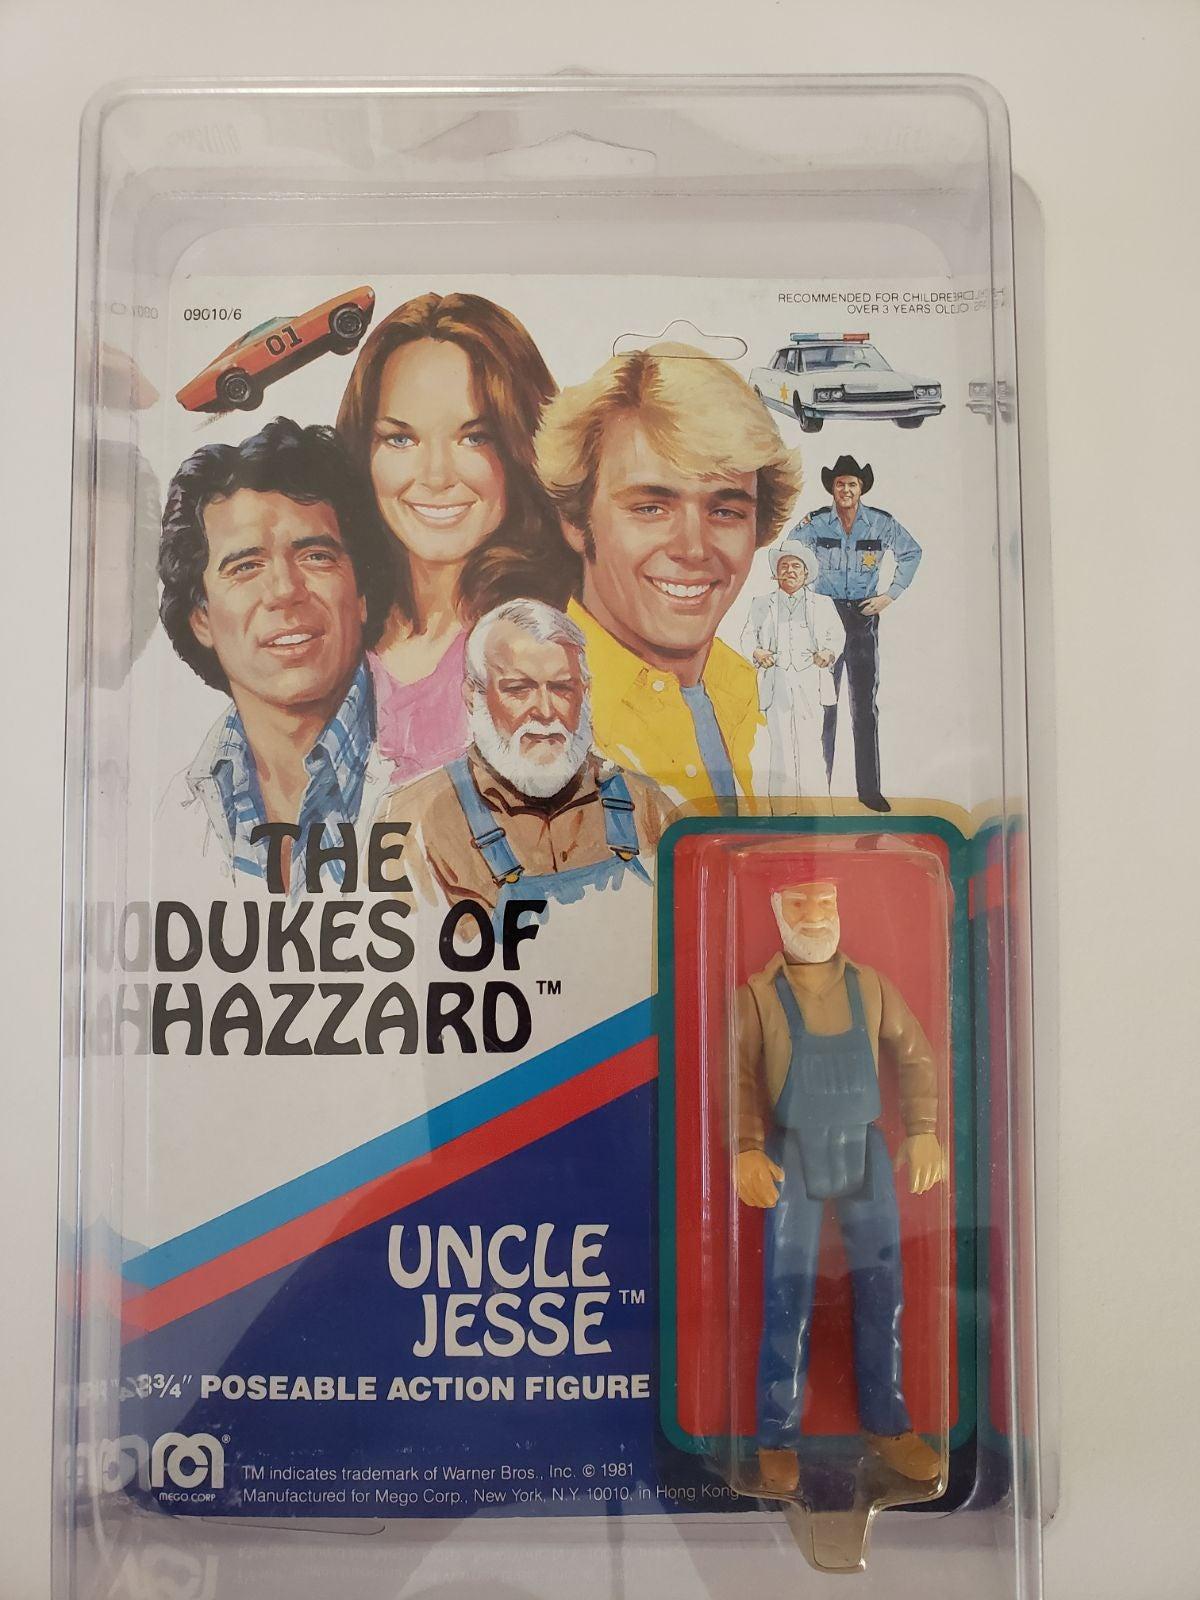 Dukes of Hazard - Uncle Jesse